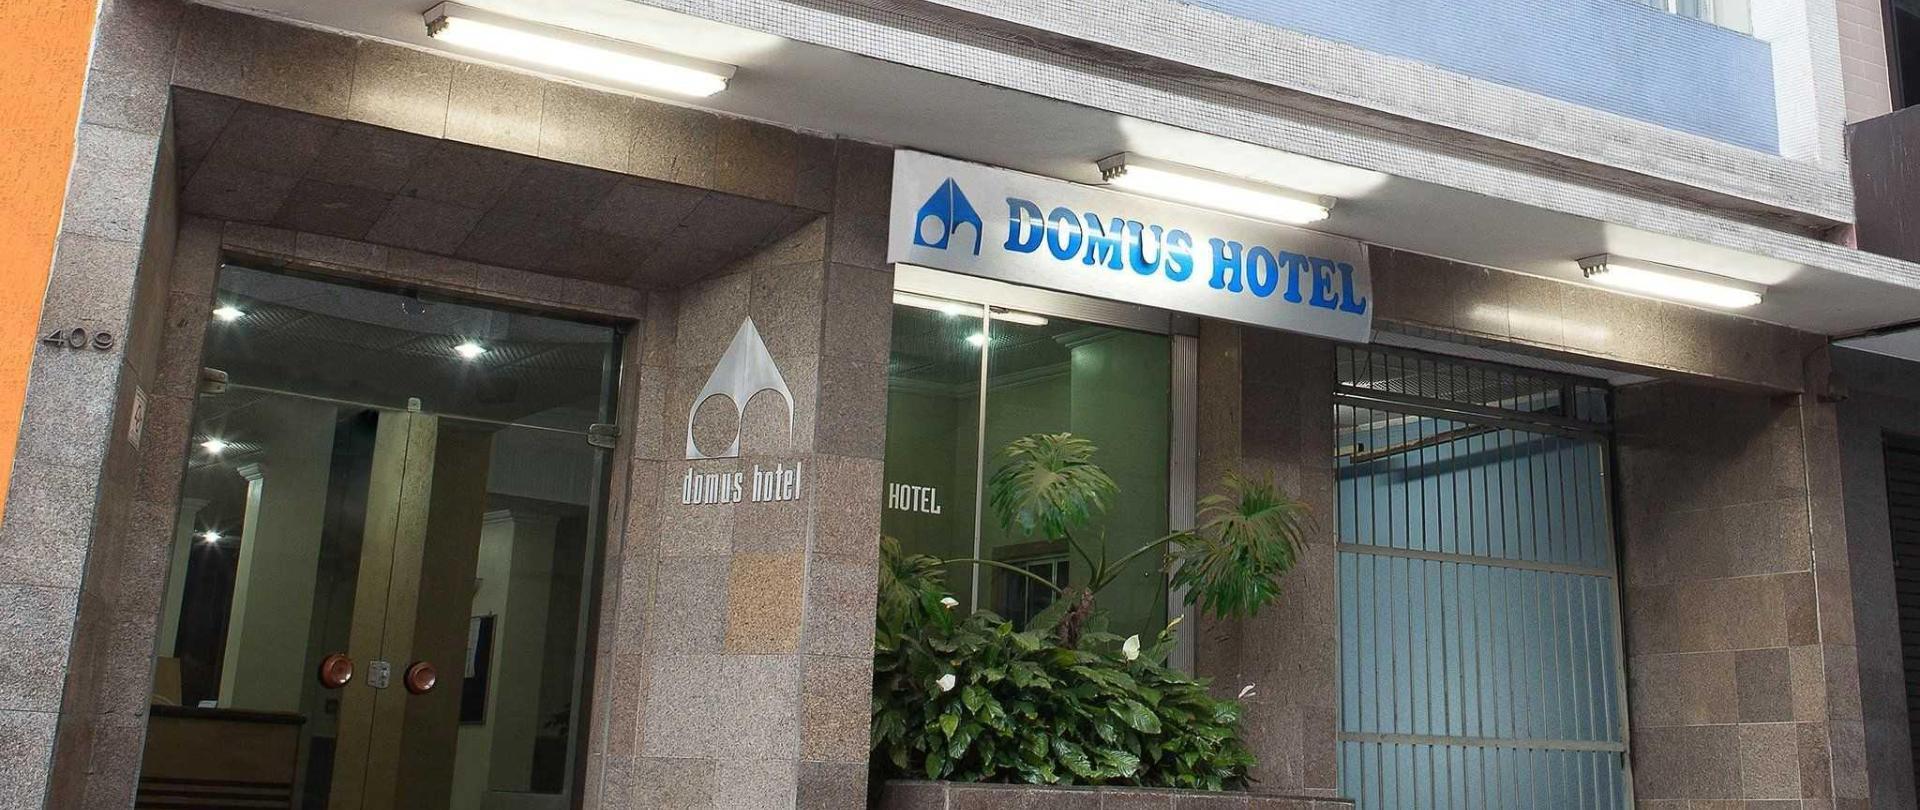 domus-hotel-fachada-centro-s-o-paulo-vf2.jpg